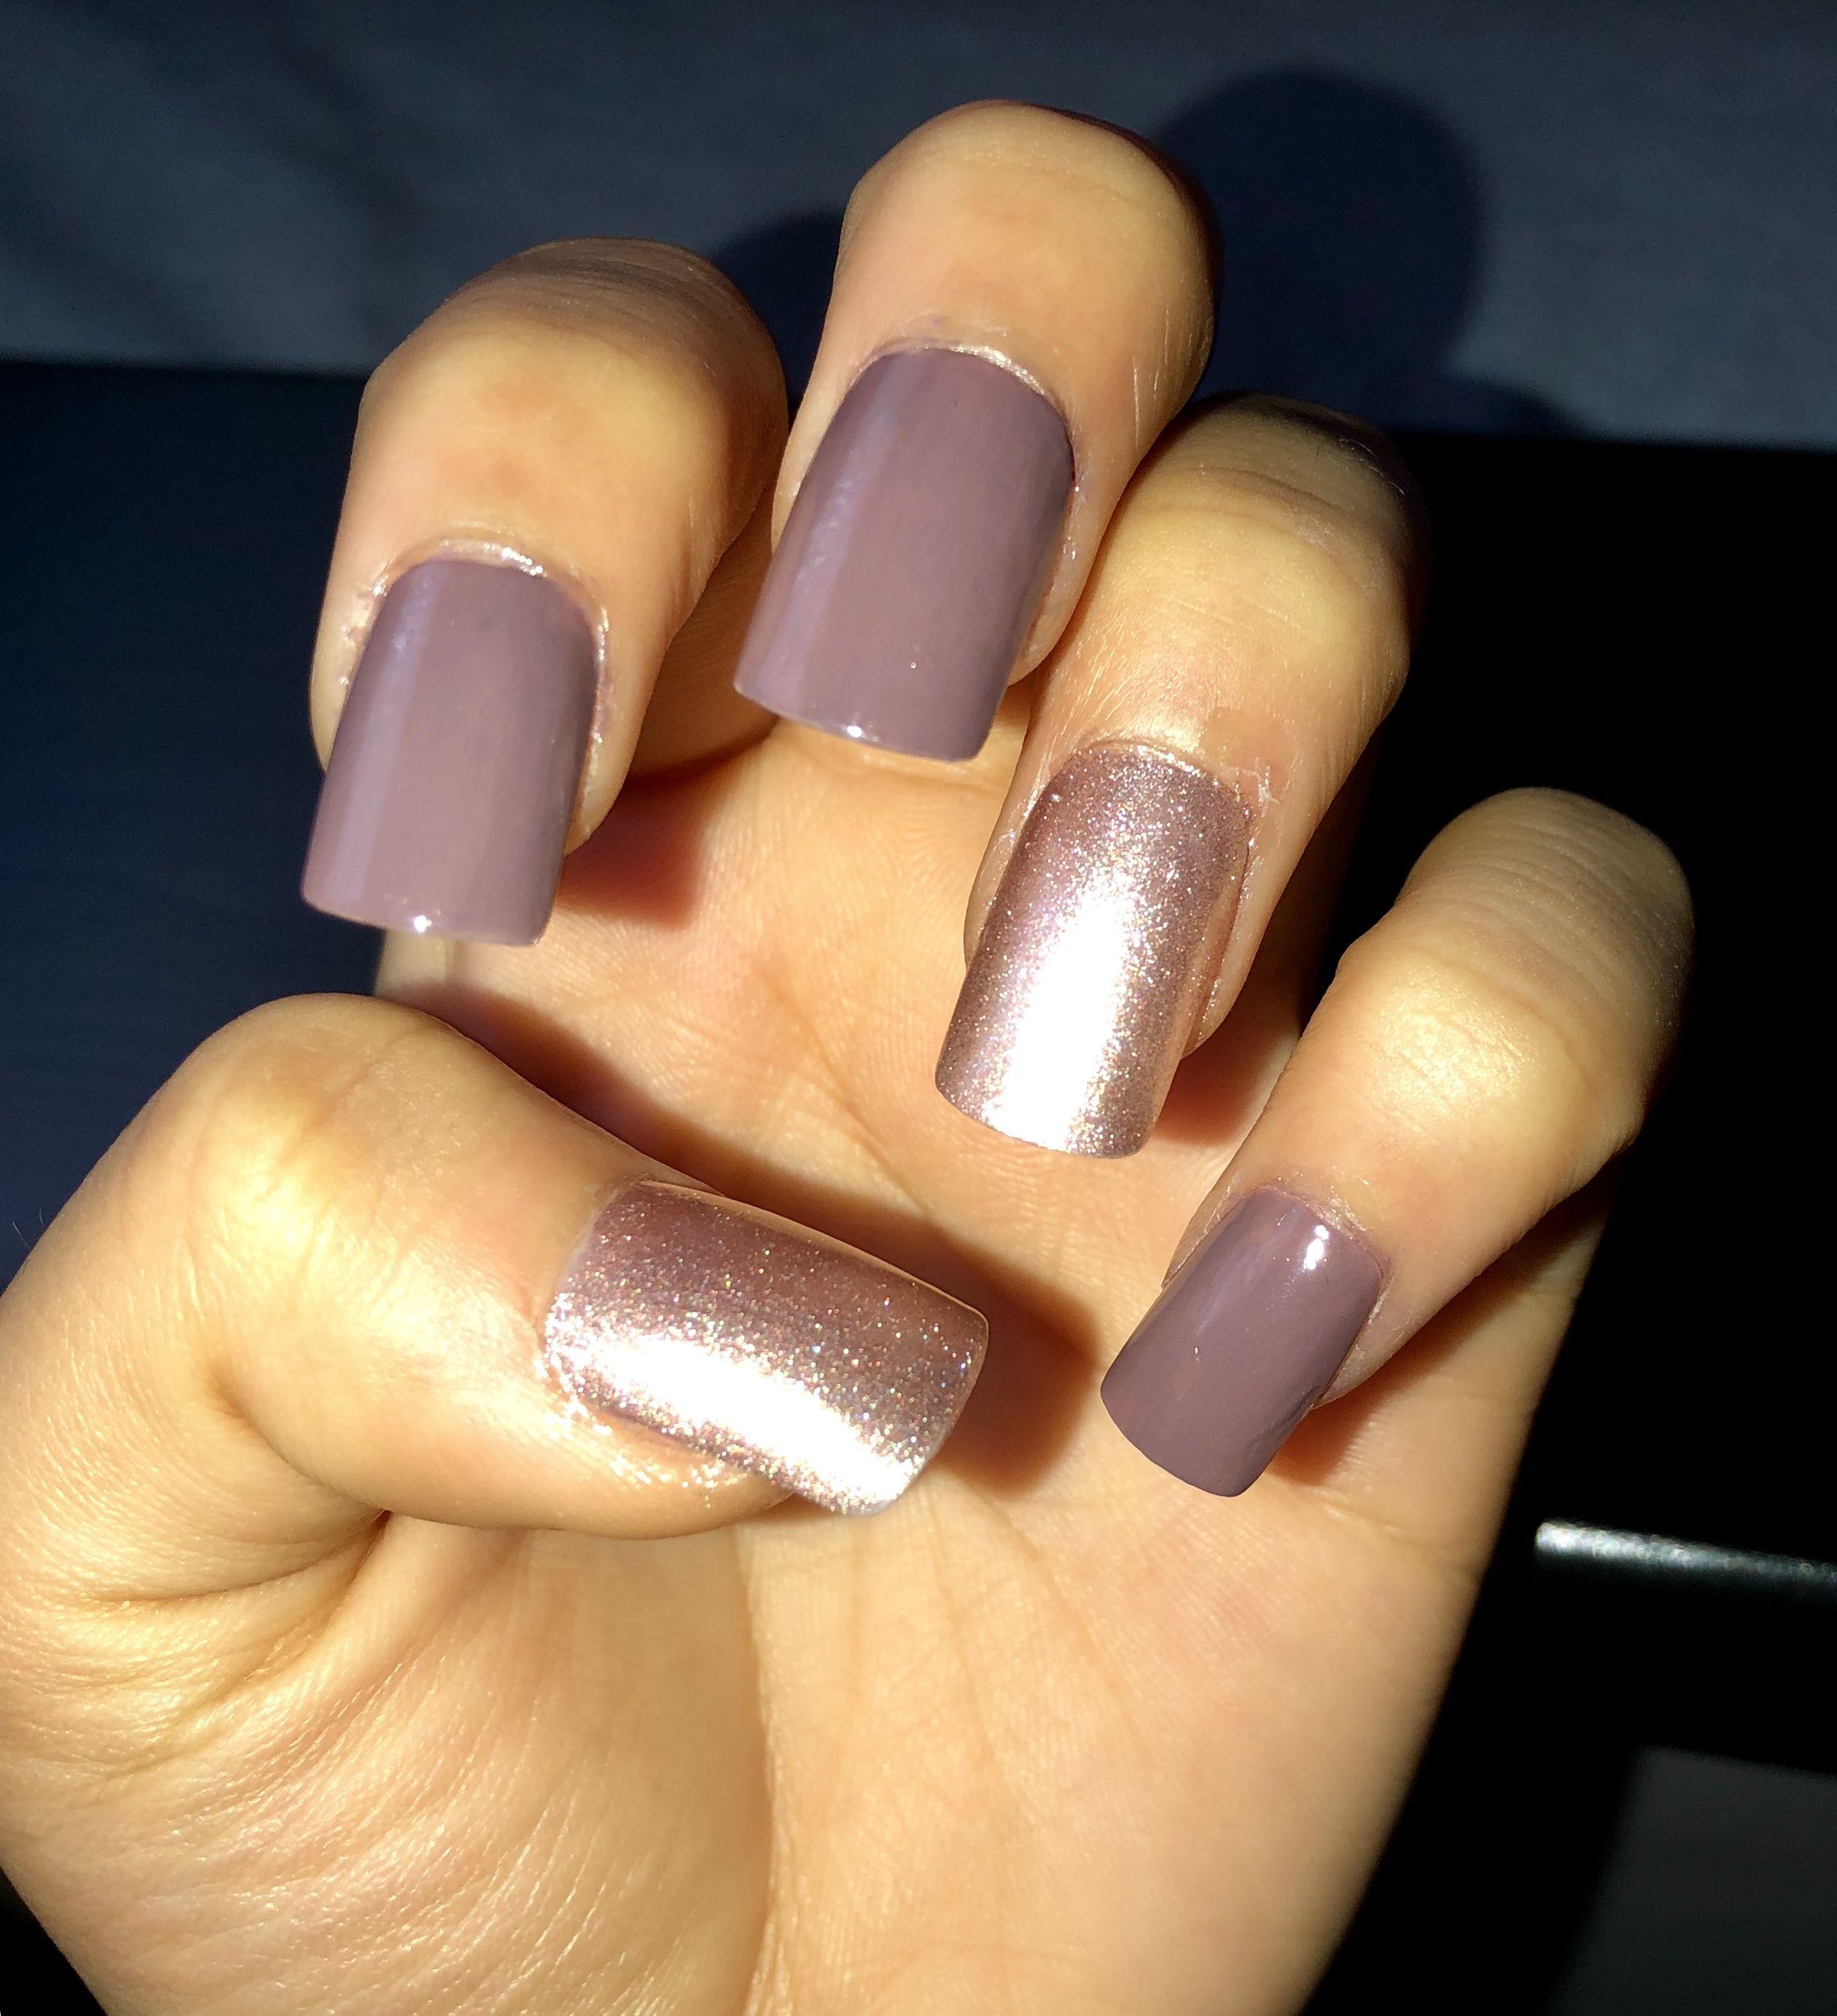 Pin by alexis gonzalez on nails pinterest